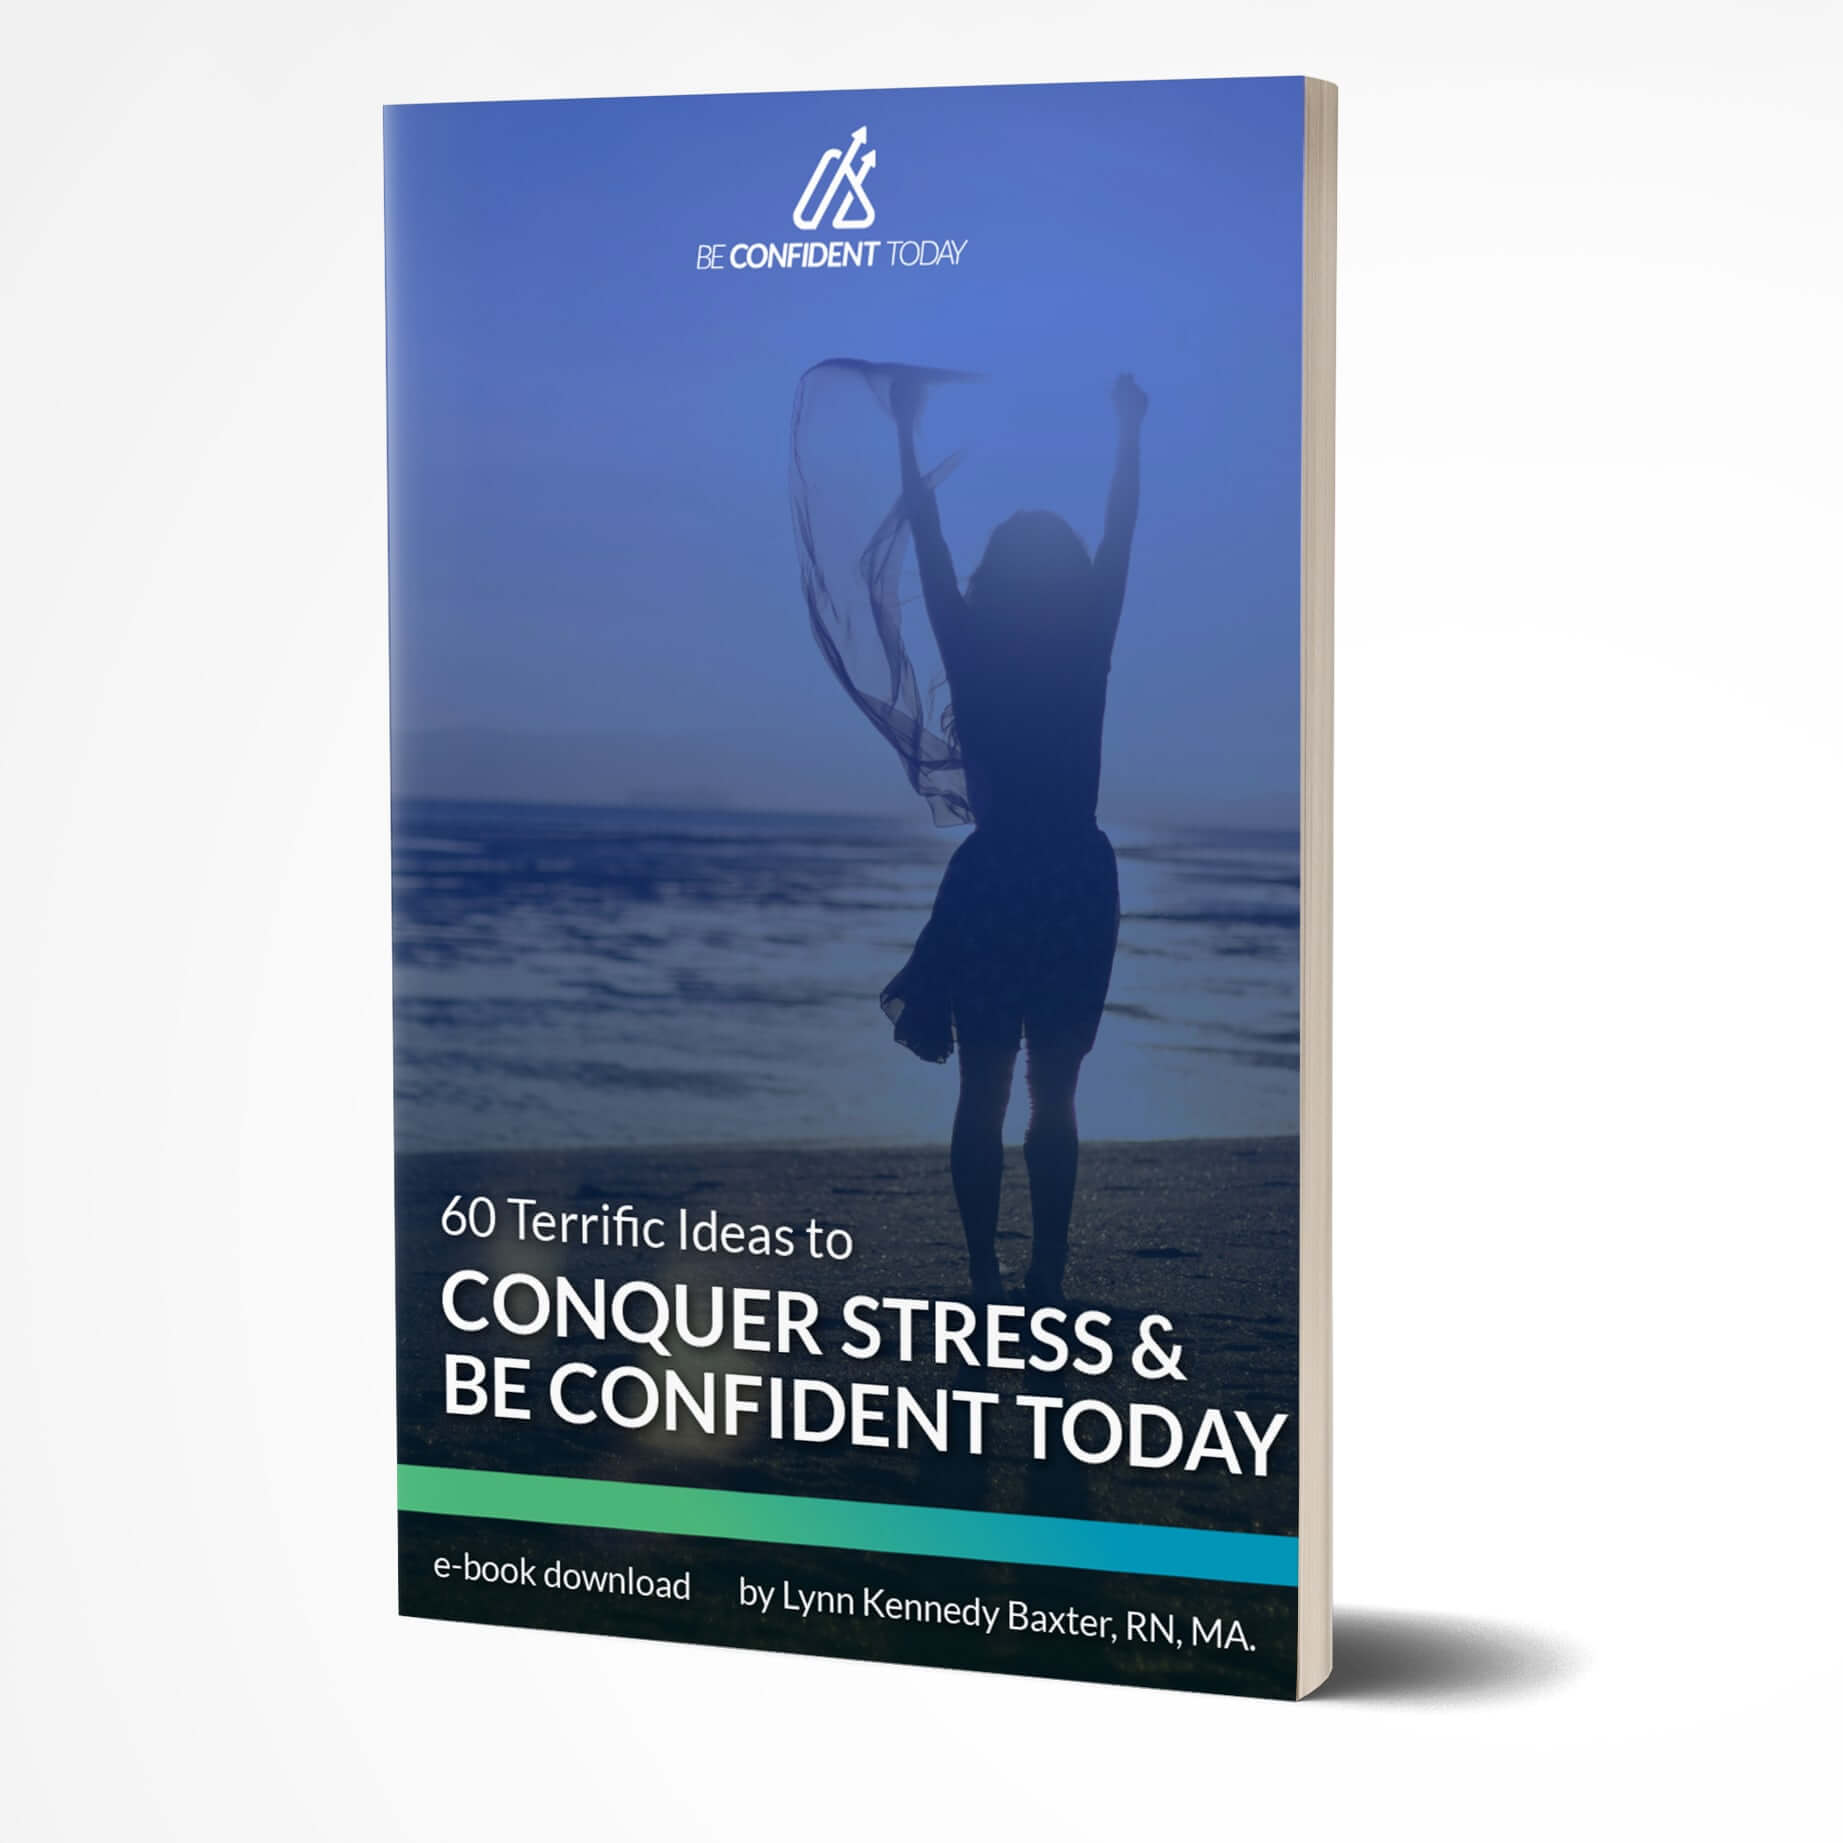 conquer-stress-ebook